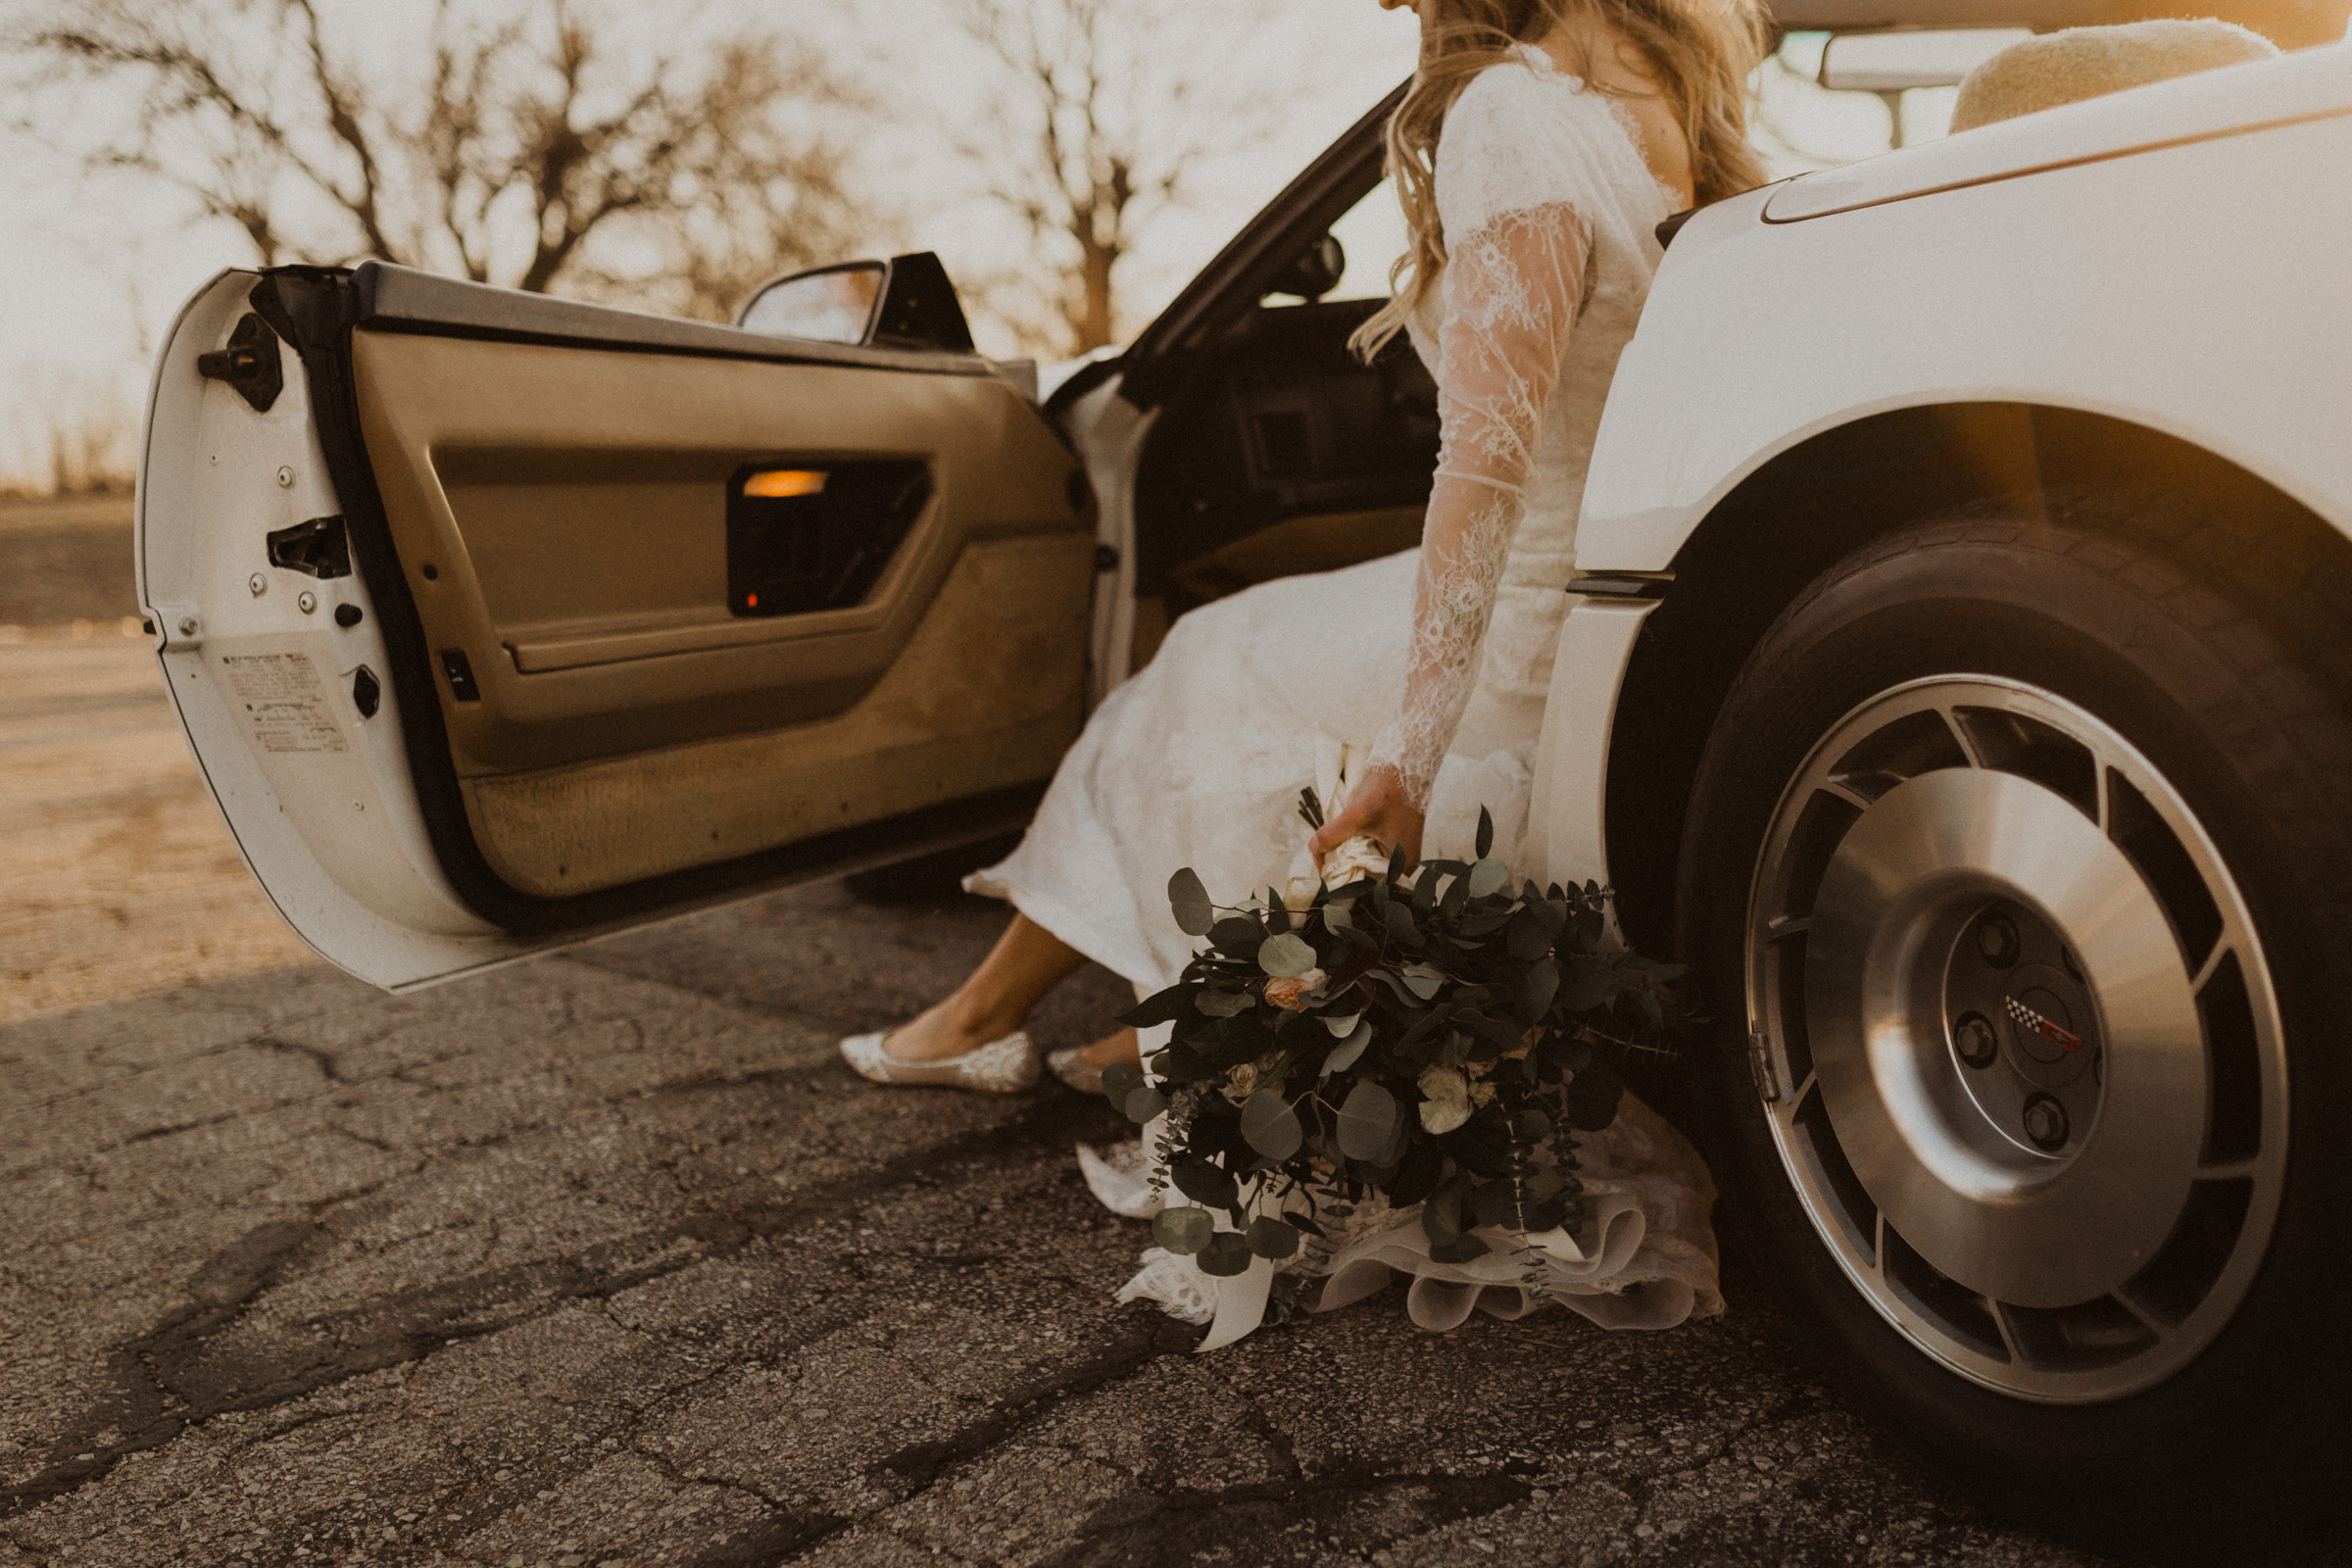 alyssa barletter photography shawnee mission park winter wedding 8th and main grandview missouri photographer-16.jpg